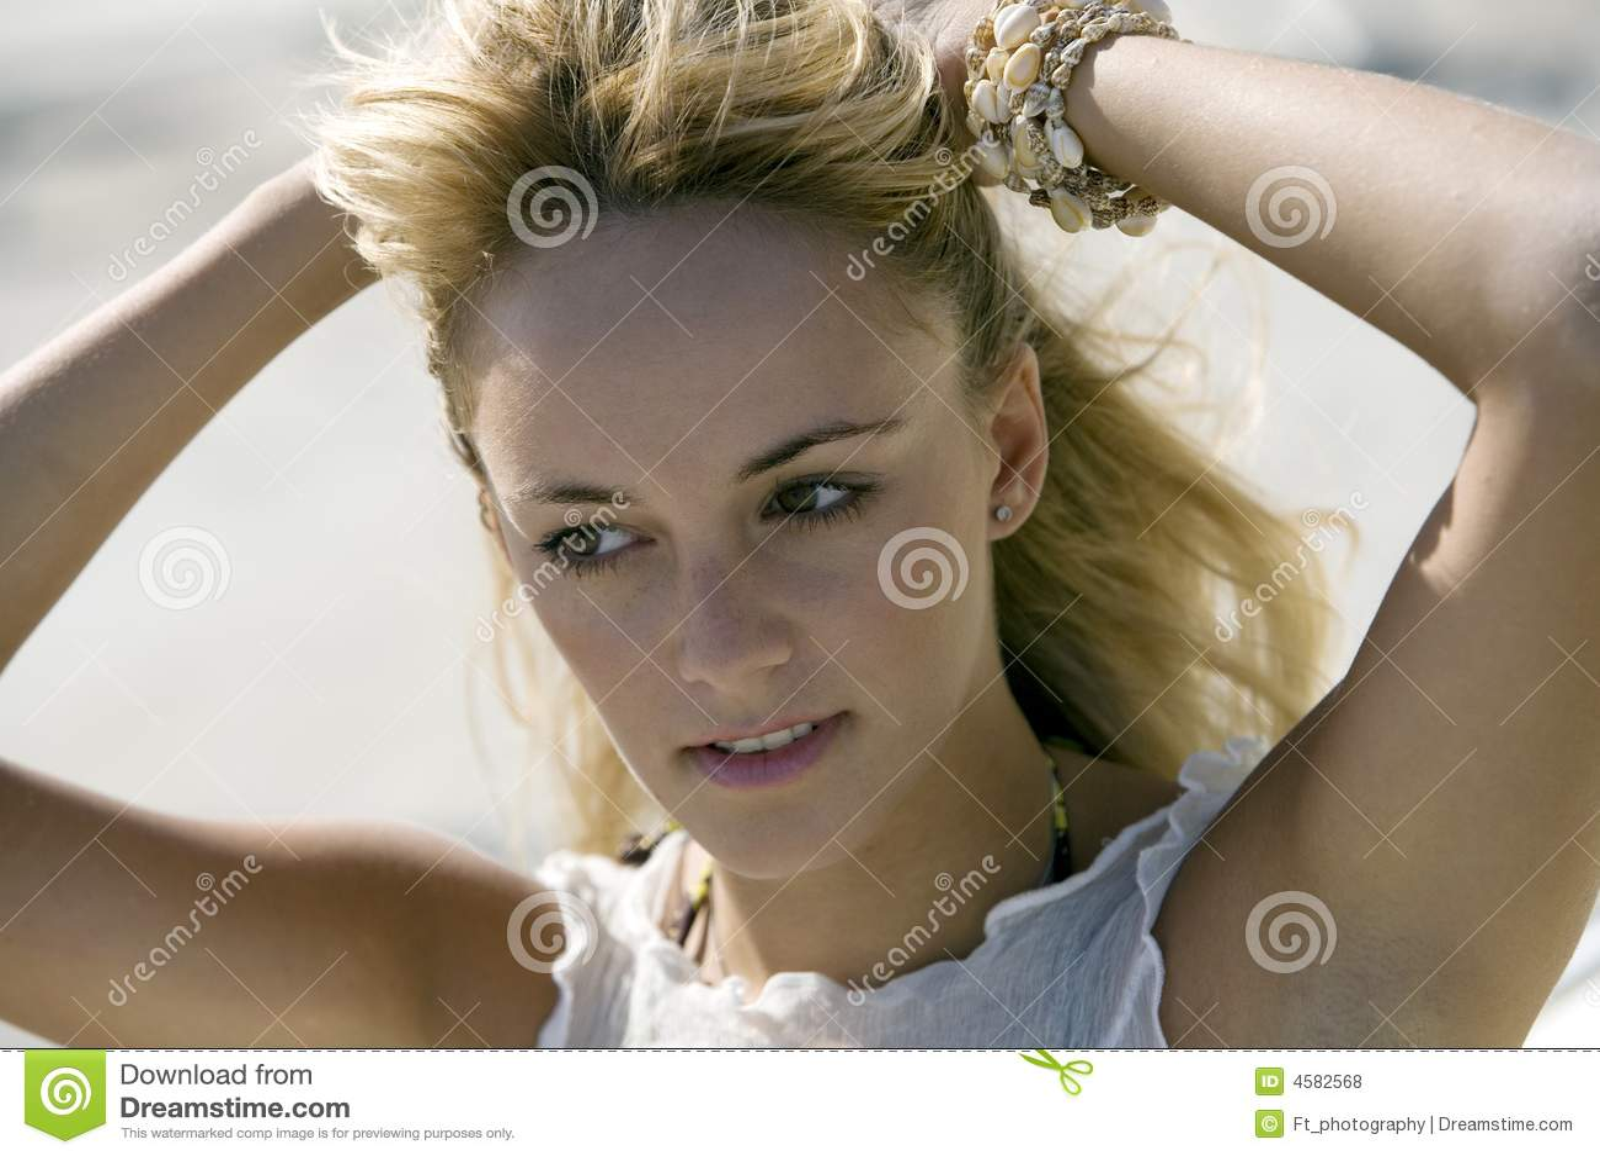 Head shot of a beautiful natural woman